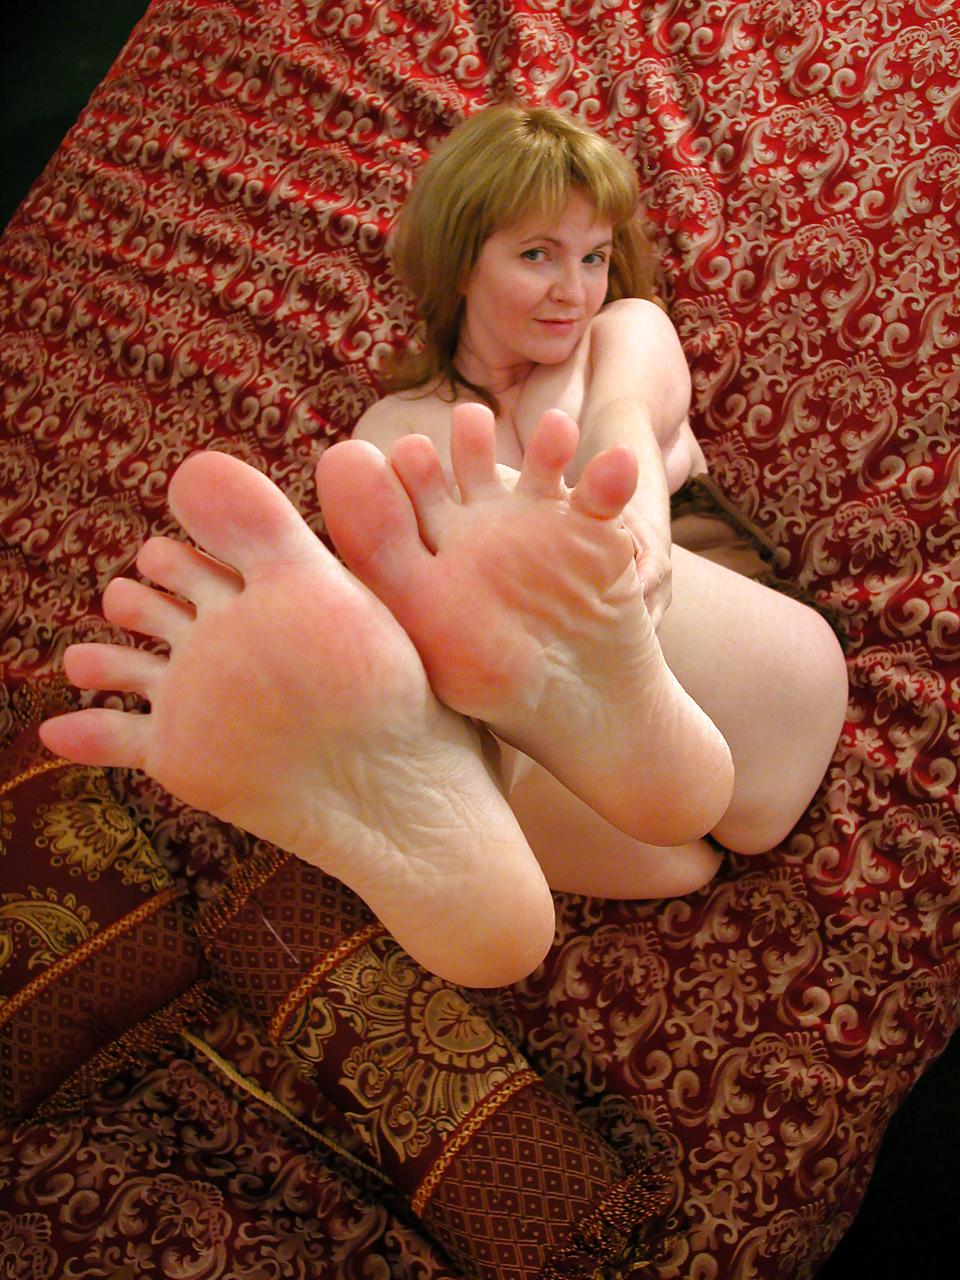 My Size 5 Feet - 6 Pics - Xhamstercom-2894